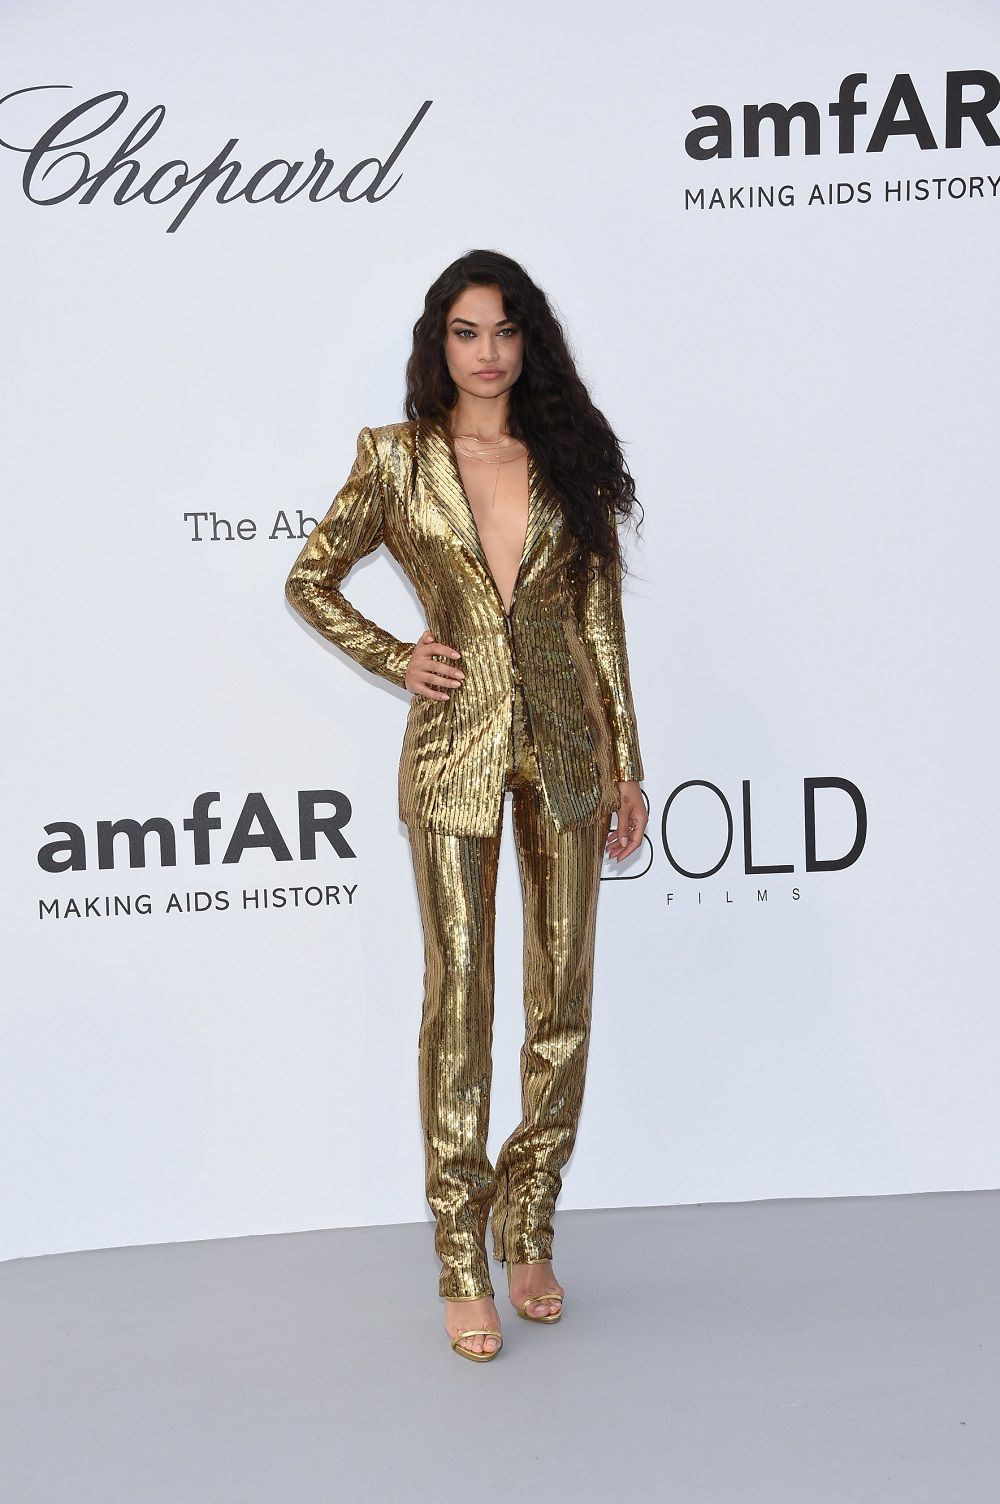 b320ba0e01 Celebrities Dressed in Philipp Plein At AmfAR Cannes Gala 2018 - MUSE  ARABIA MAGAZINE